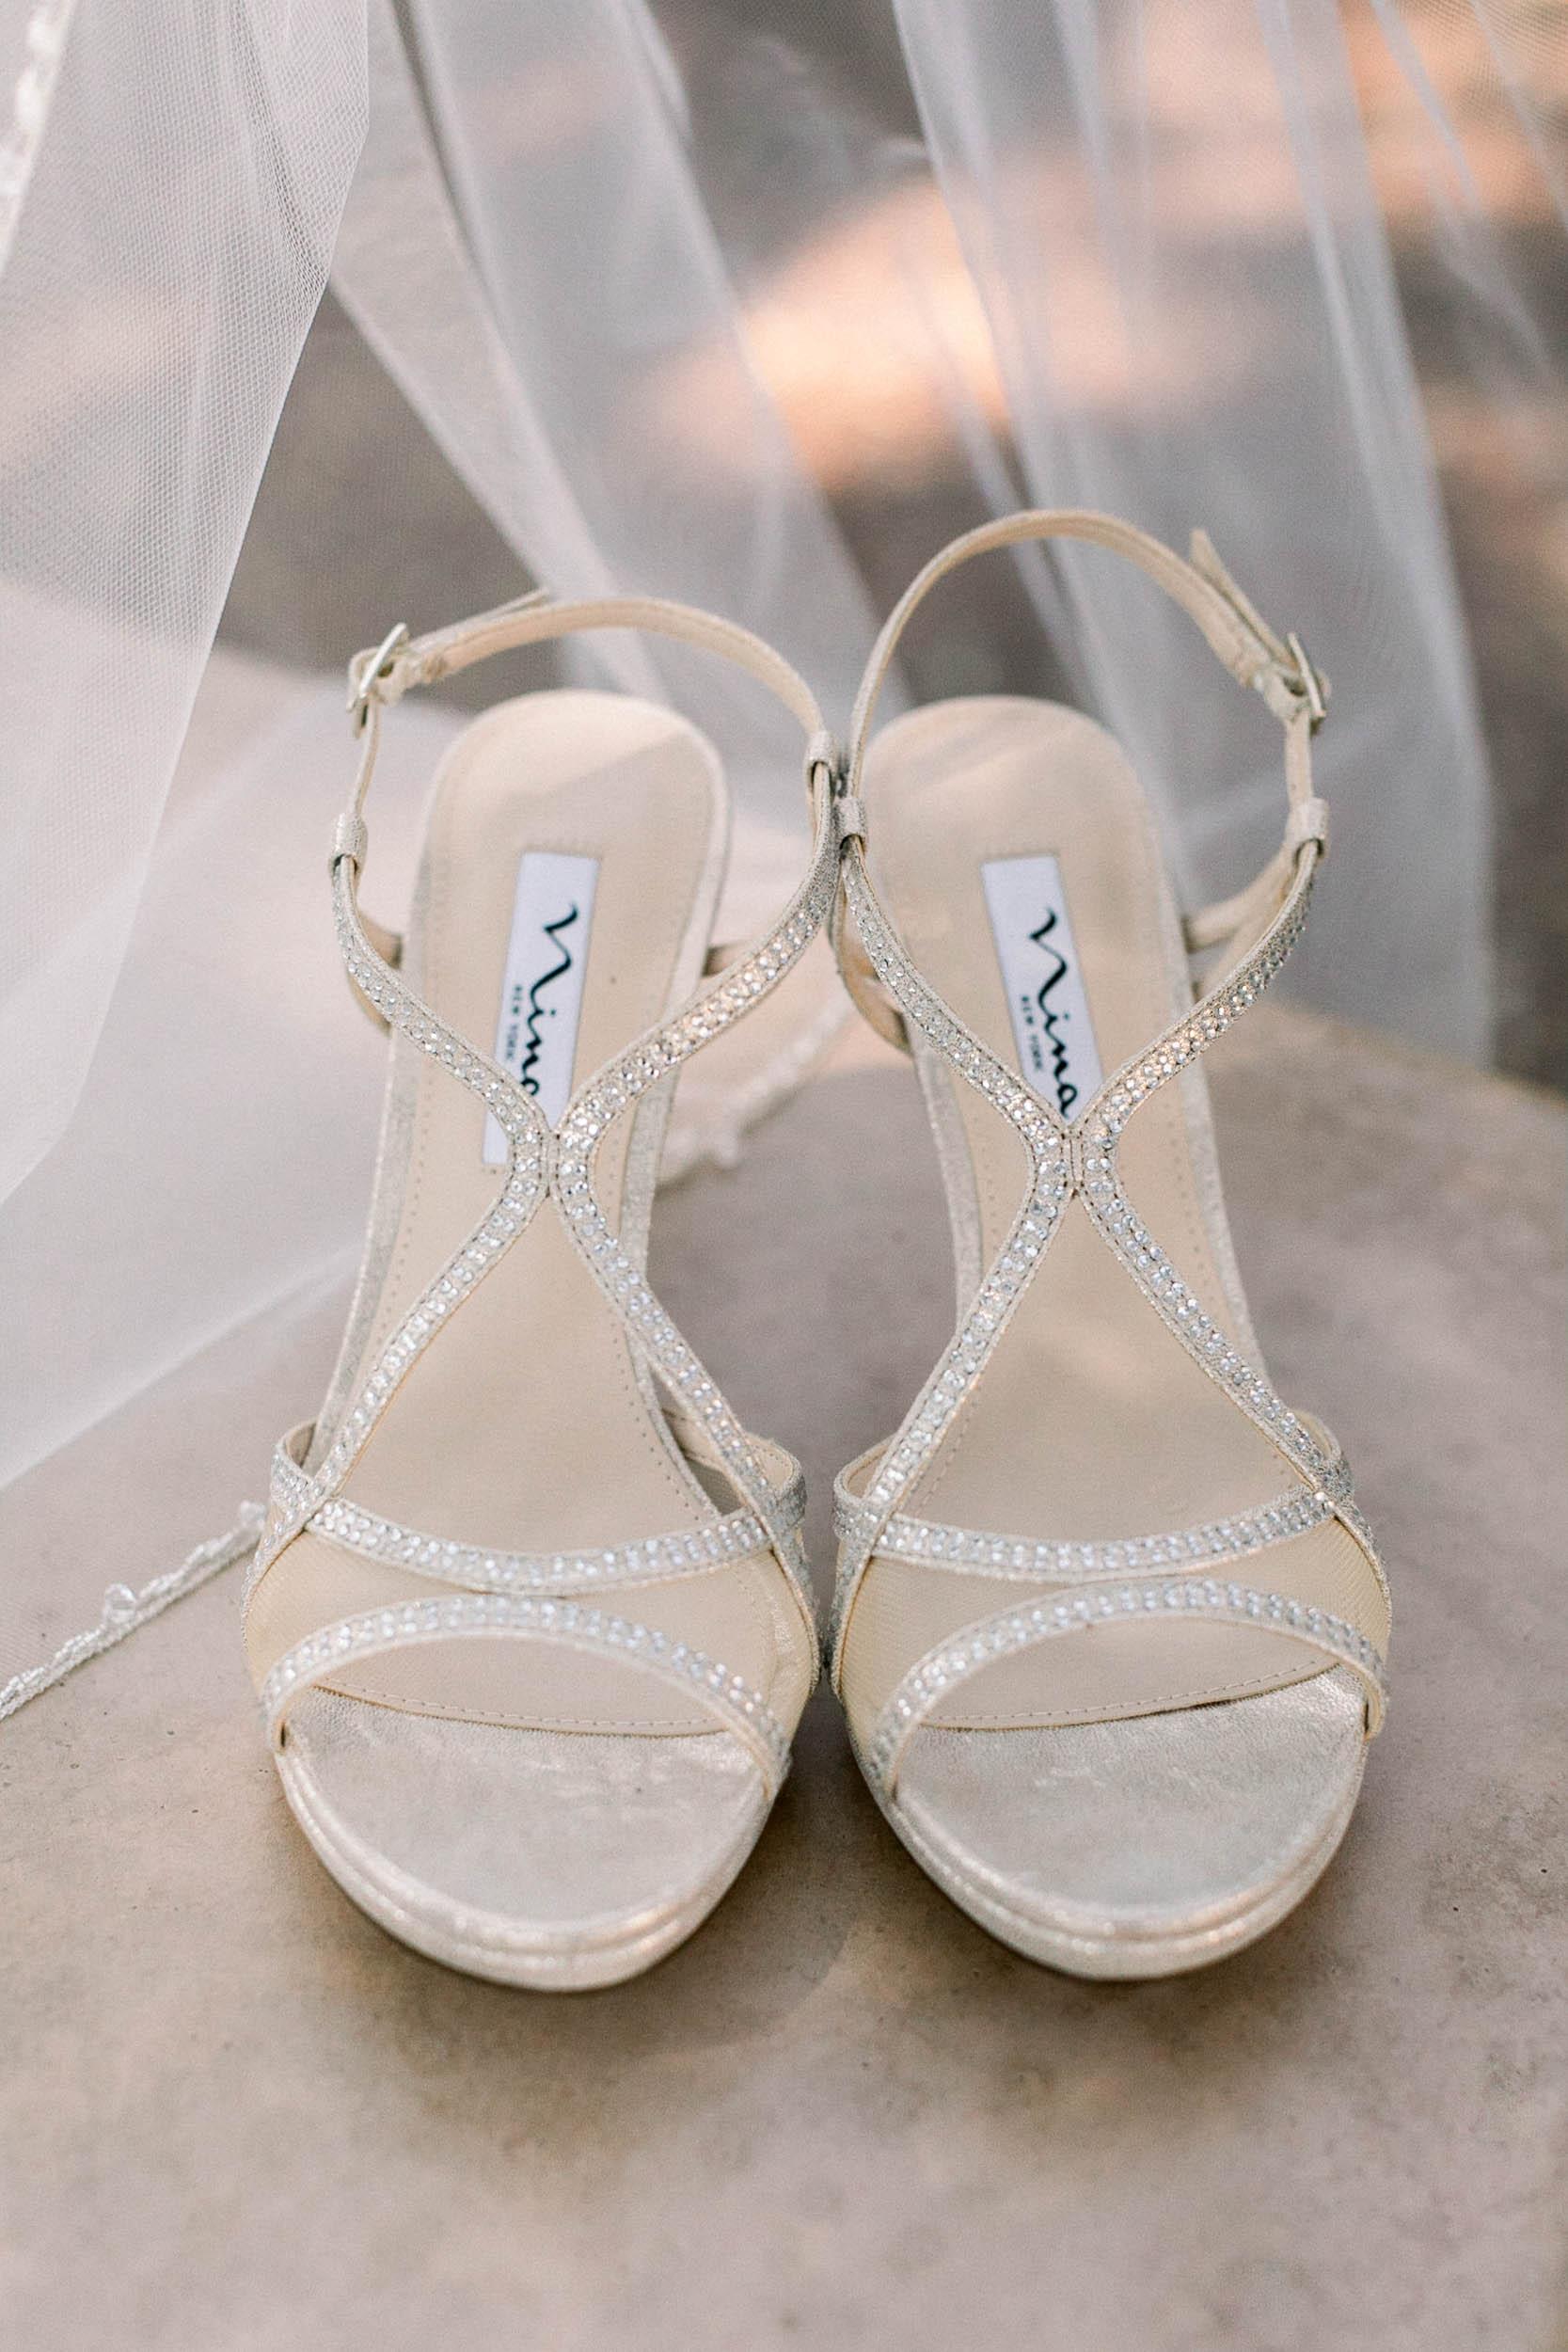 Las Positas Wedding_Buena Lane Photography_090118ER18.jpg